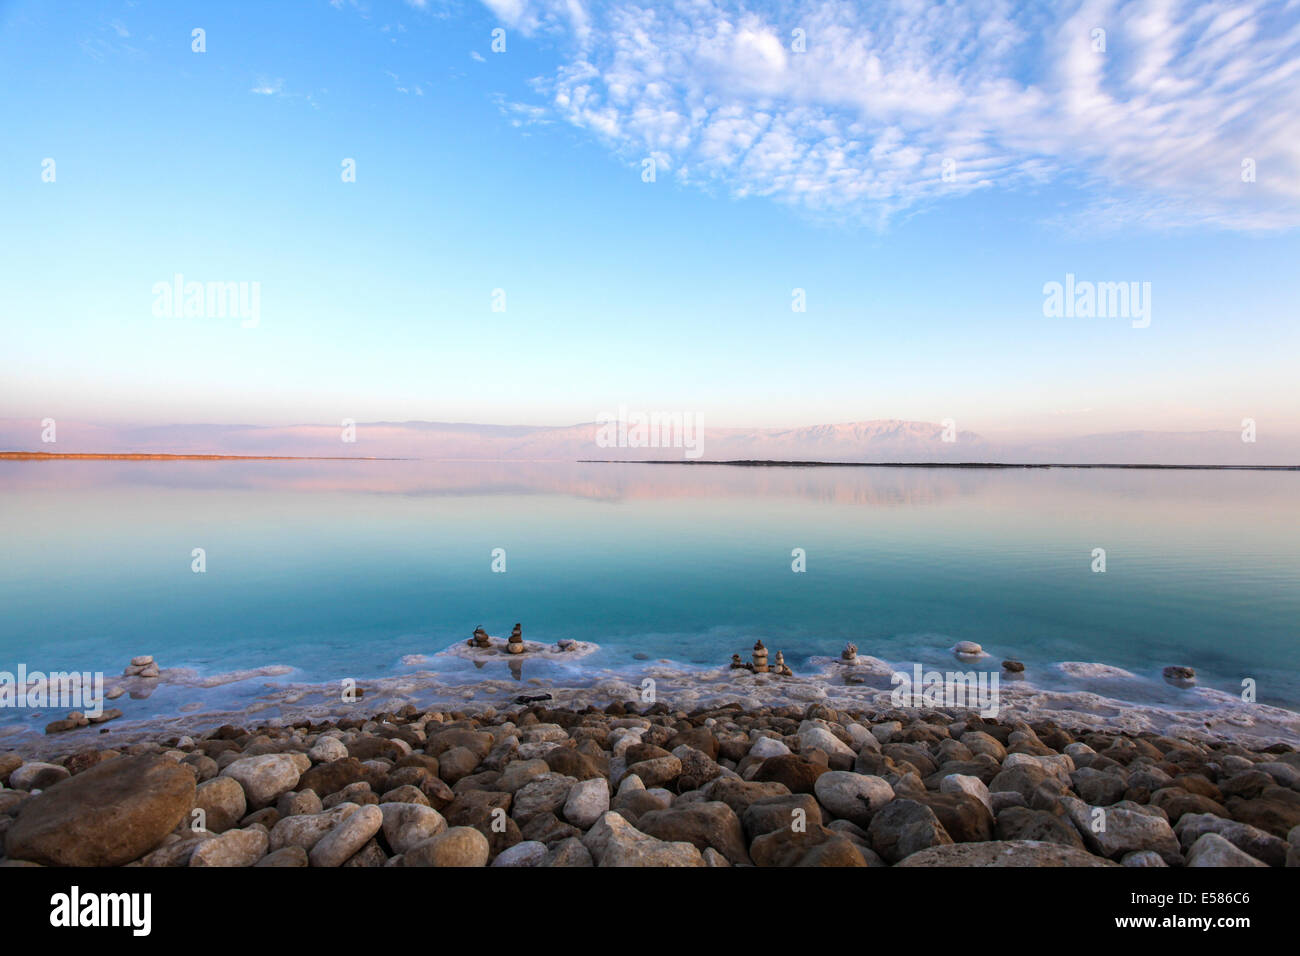 Israel, Dead Sea landscape view - Stock Image